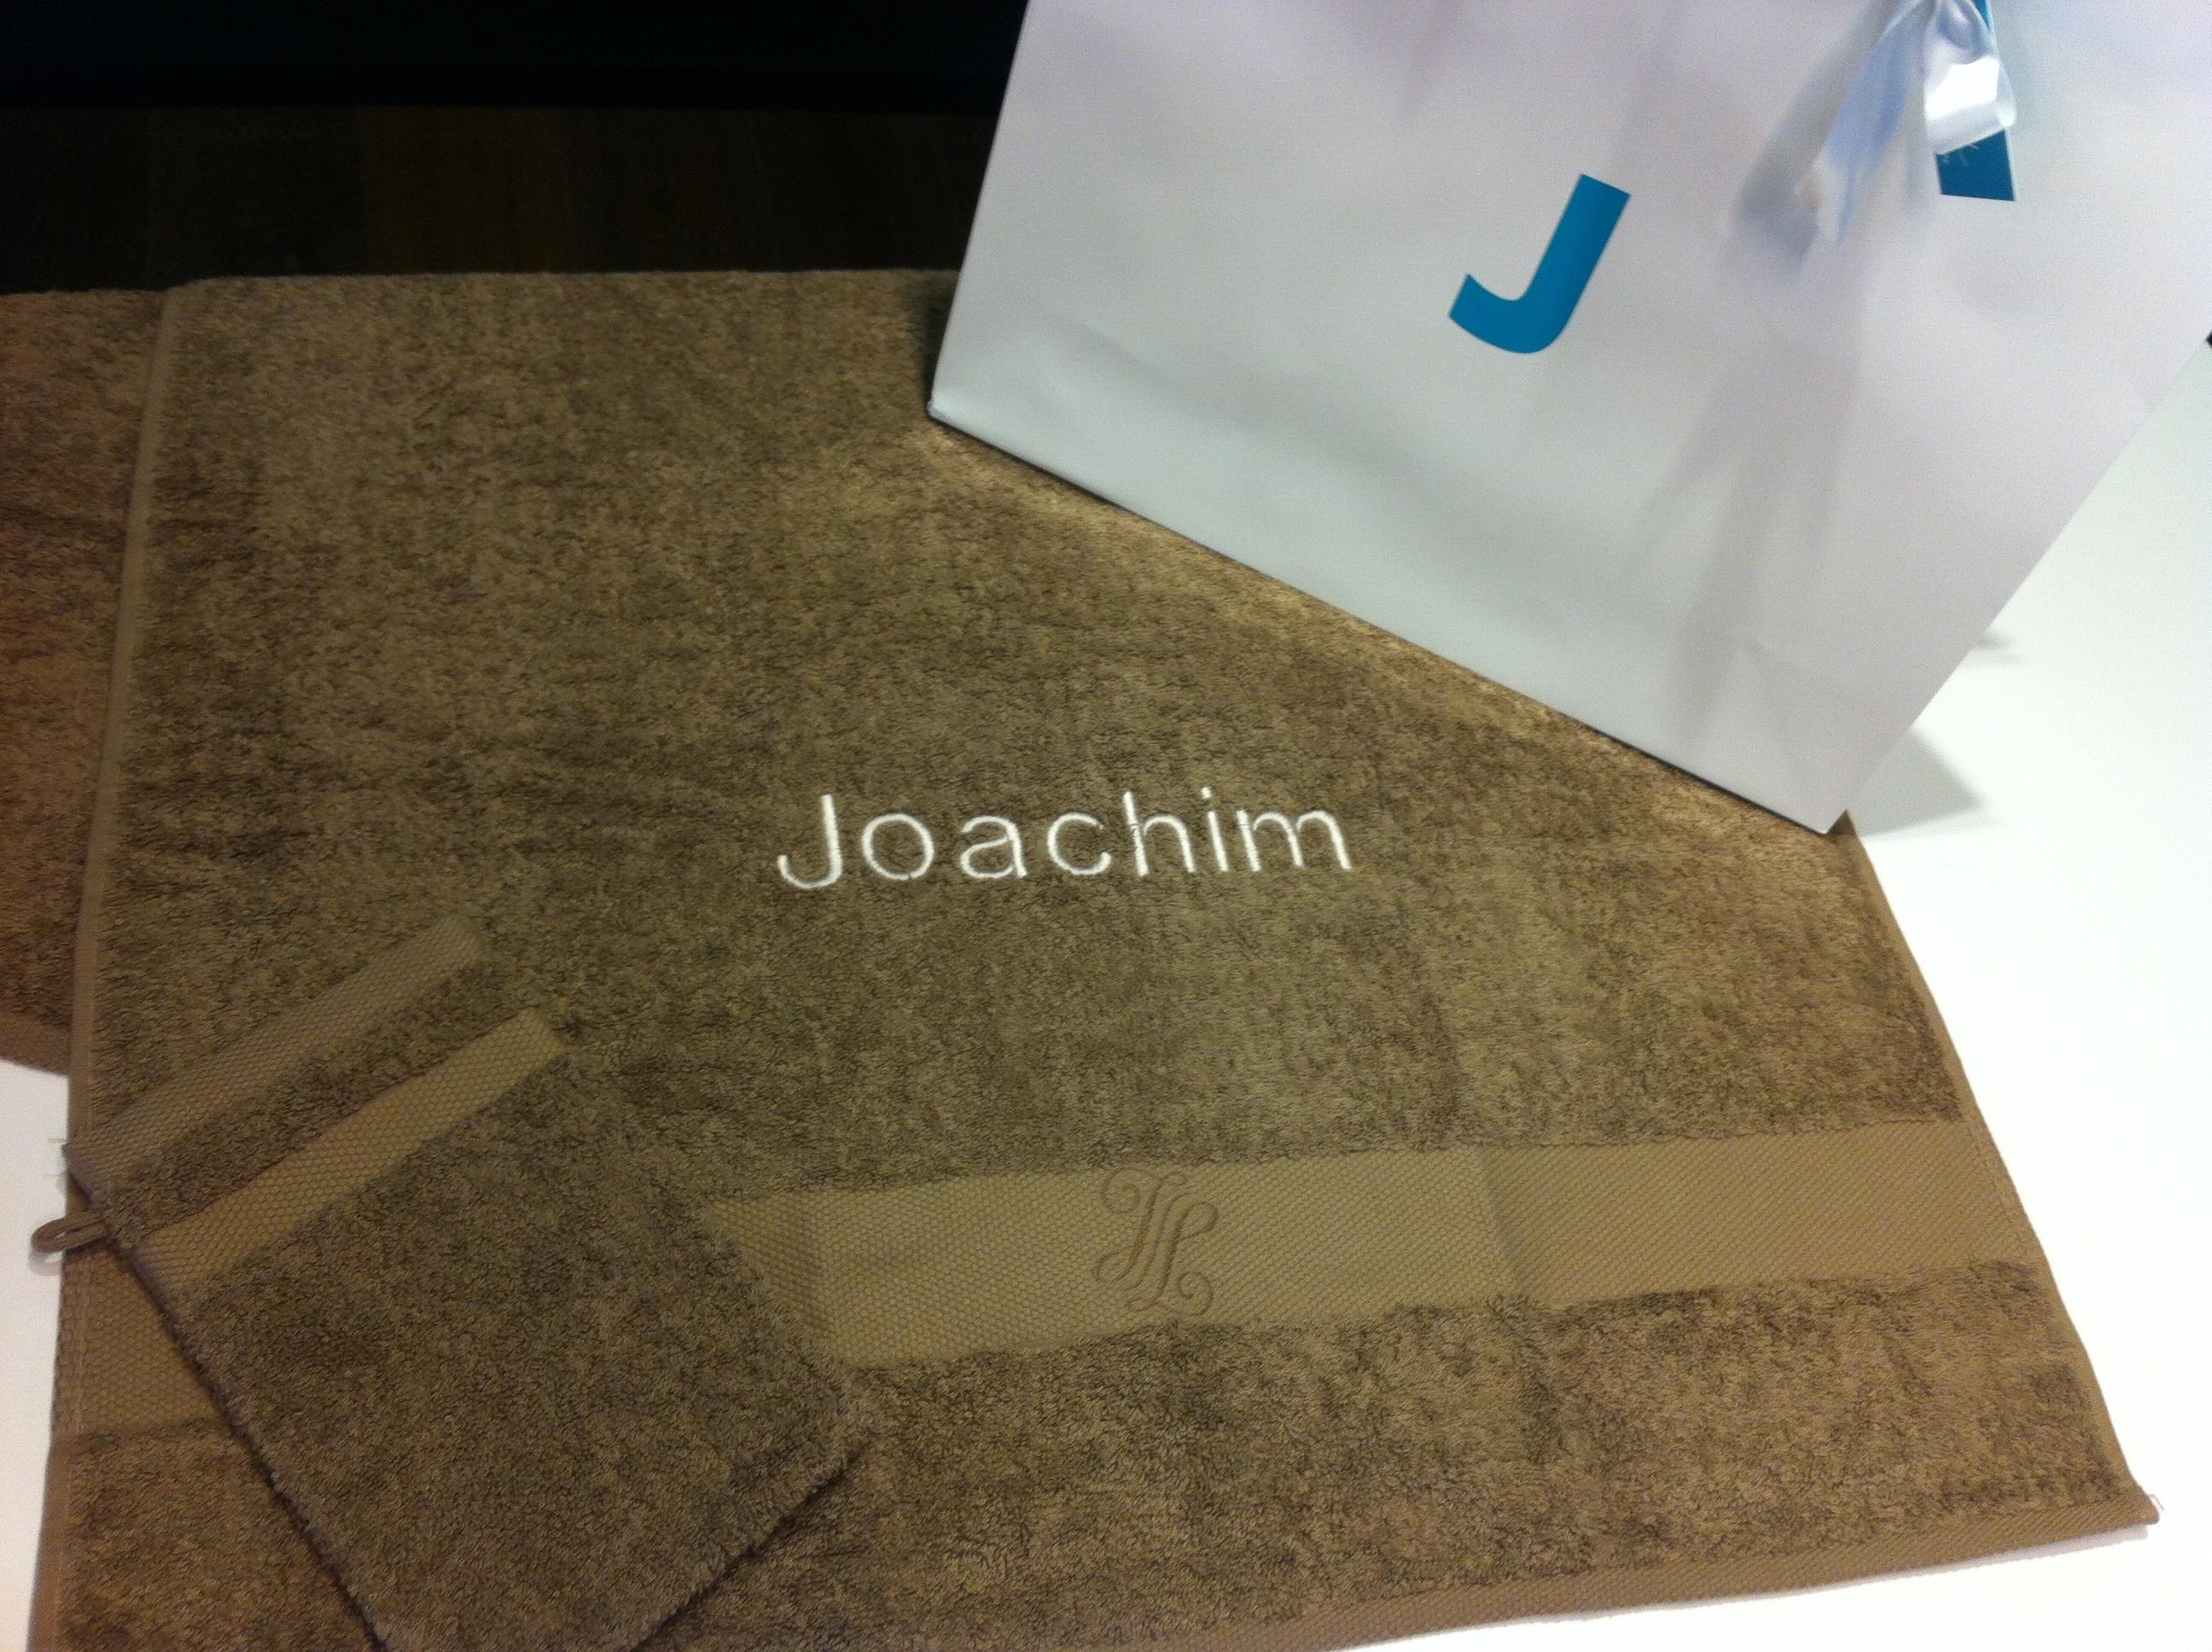 Joachim_01